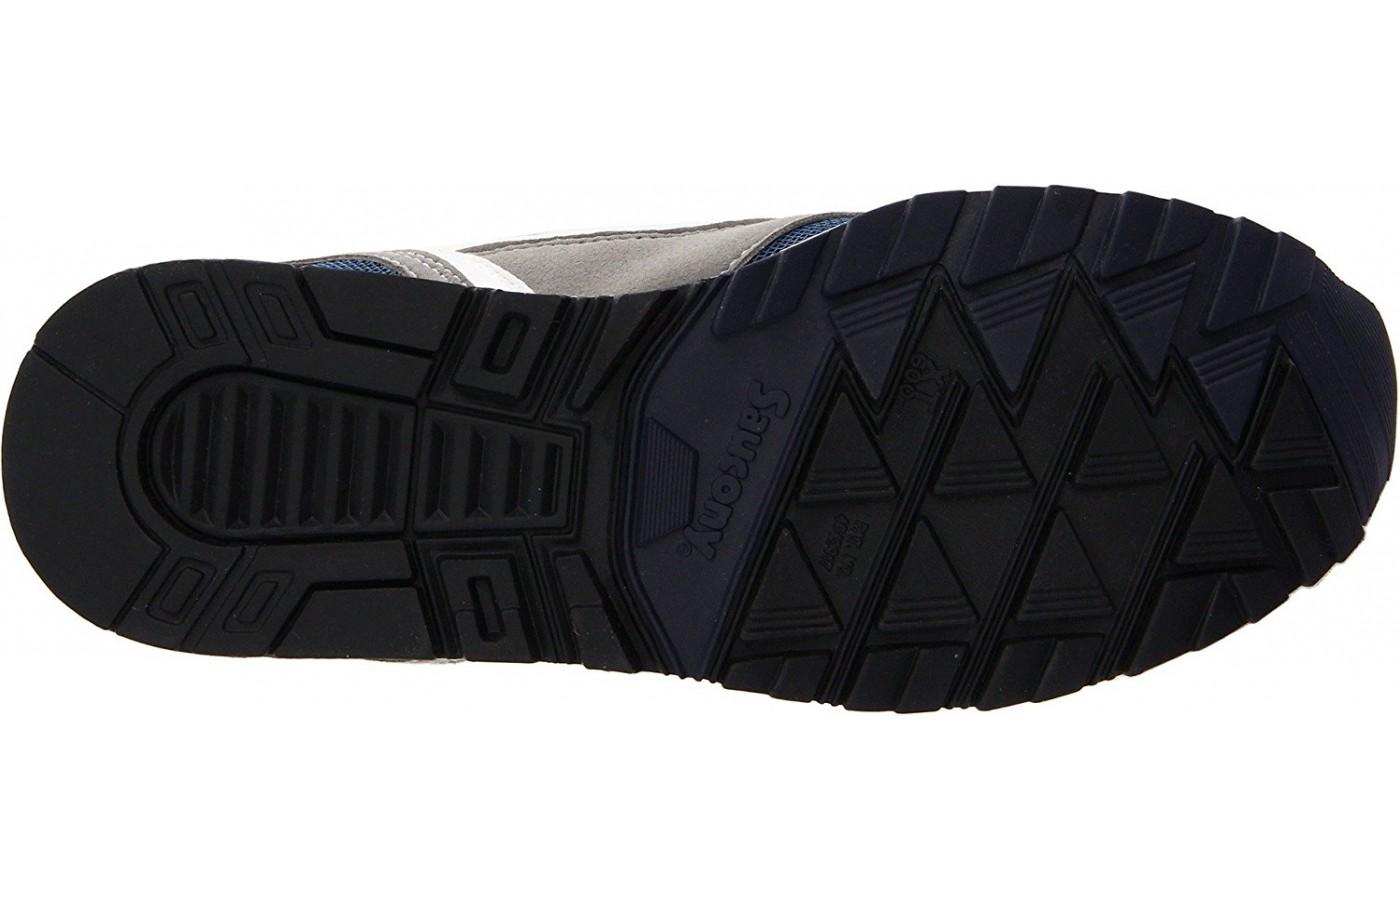 Saucony Shadow 6000 sole